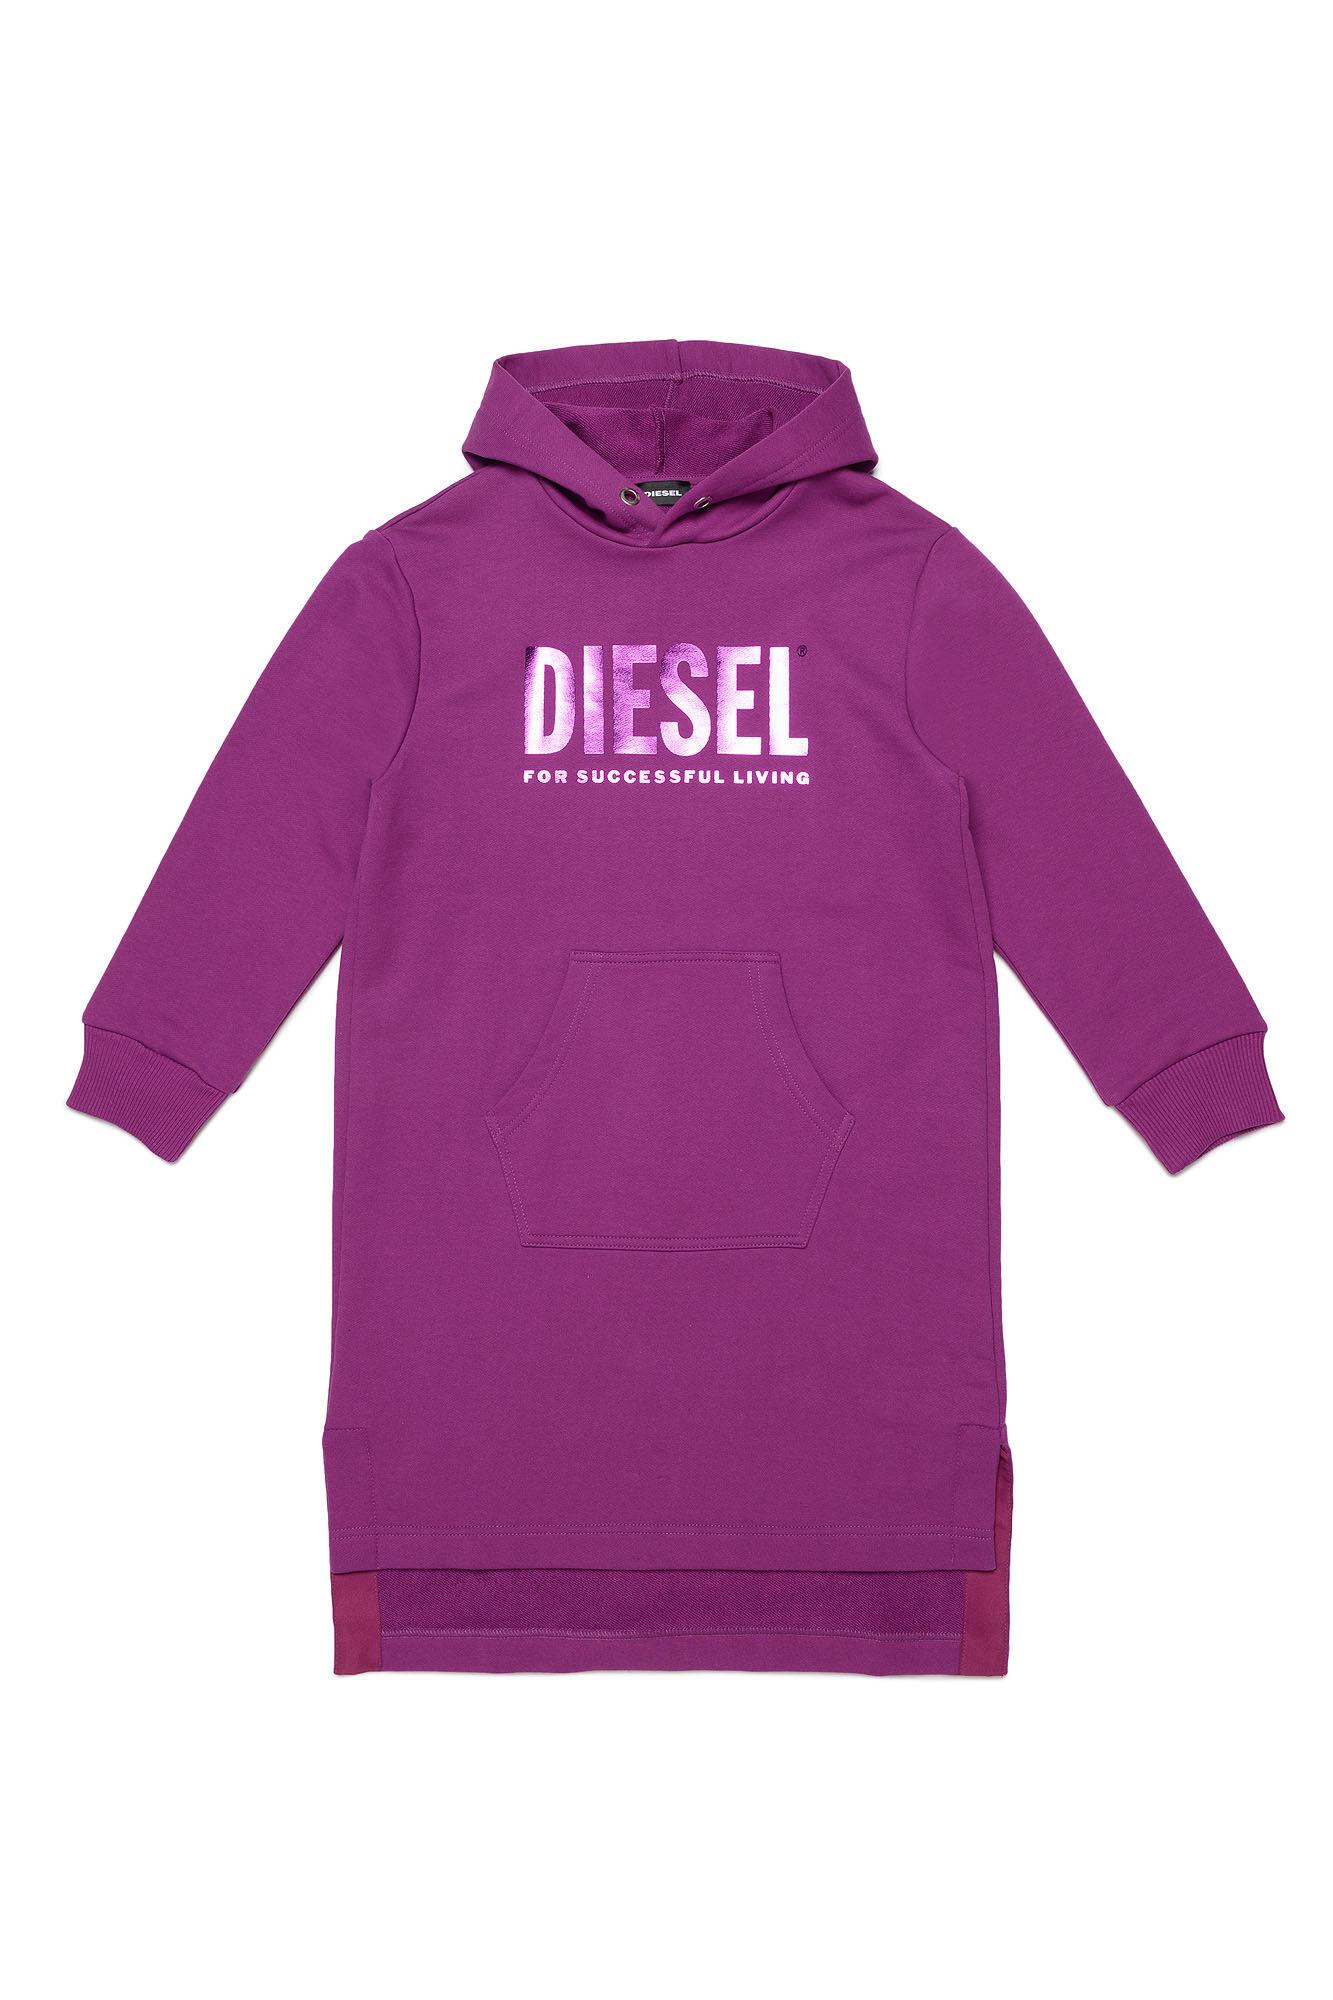 Dilset Abito - Diesel Kid